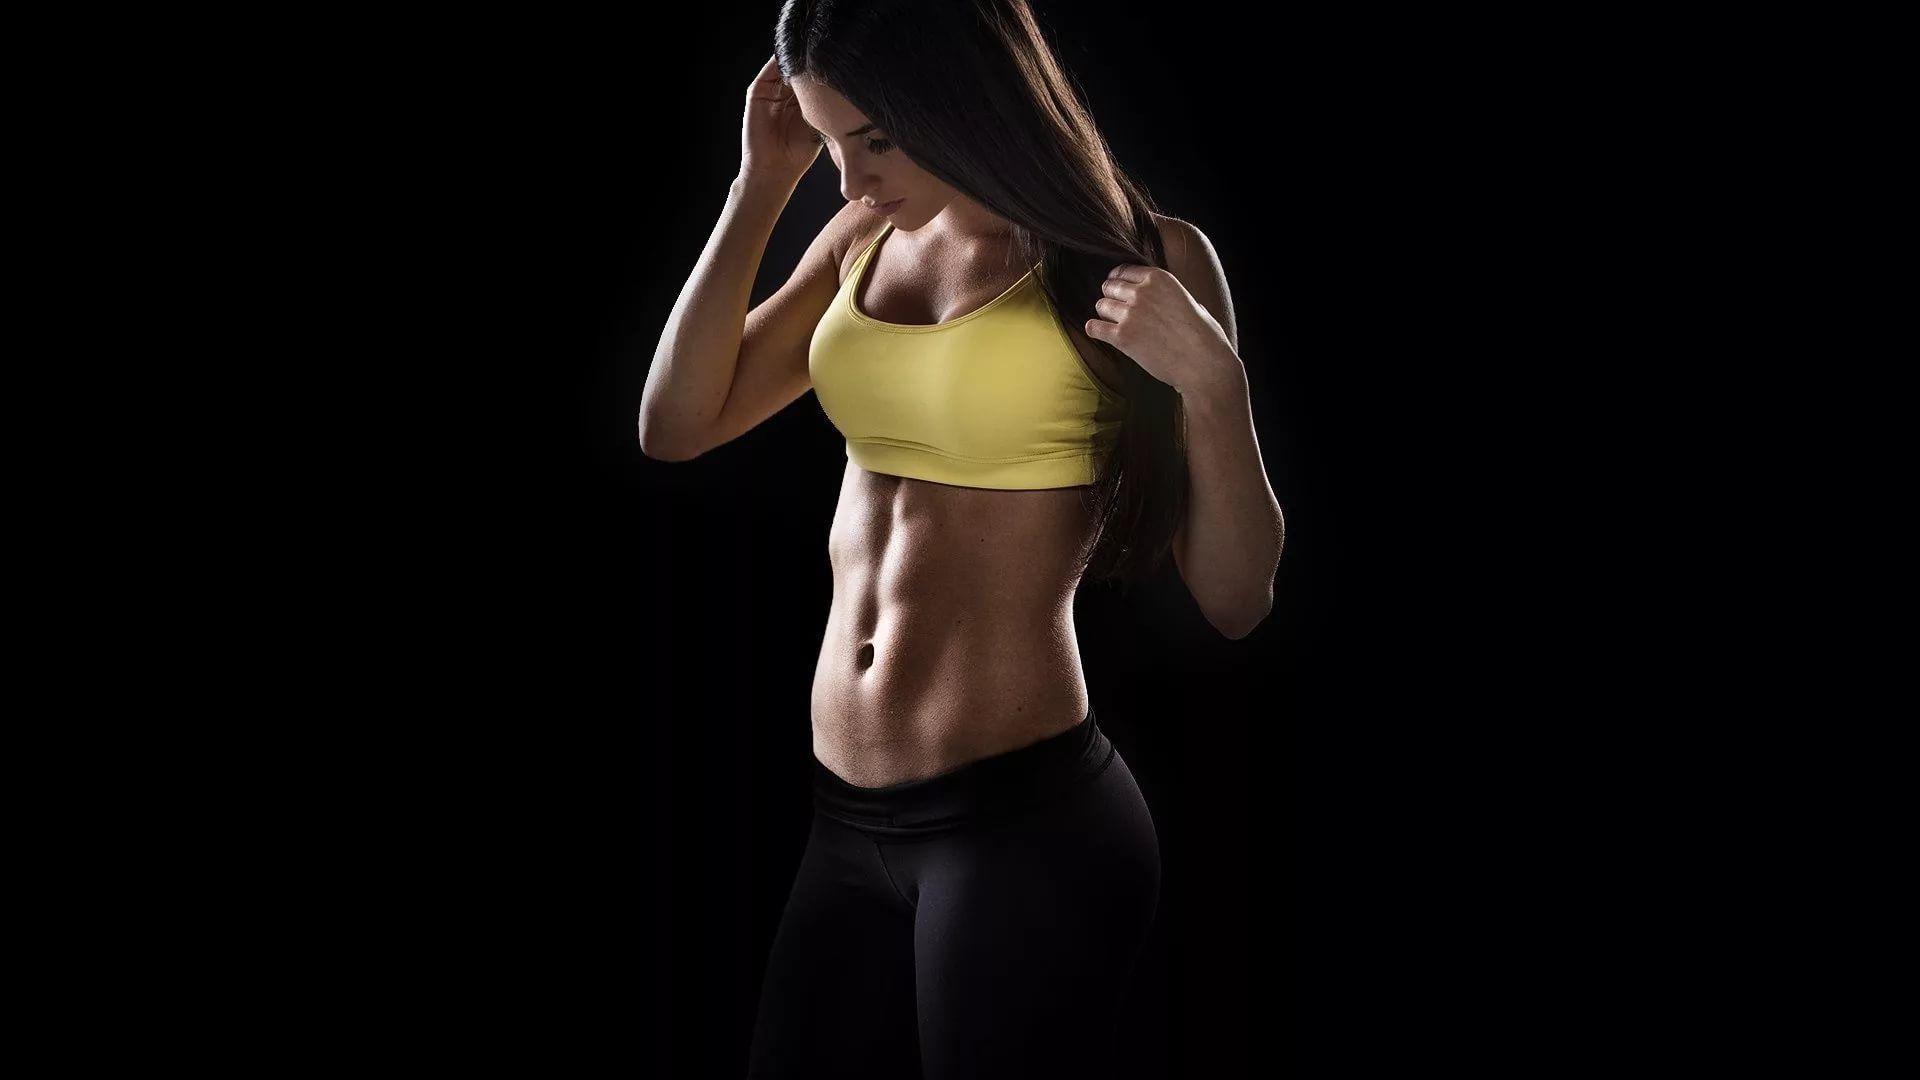 Workout desktop wallpaper